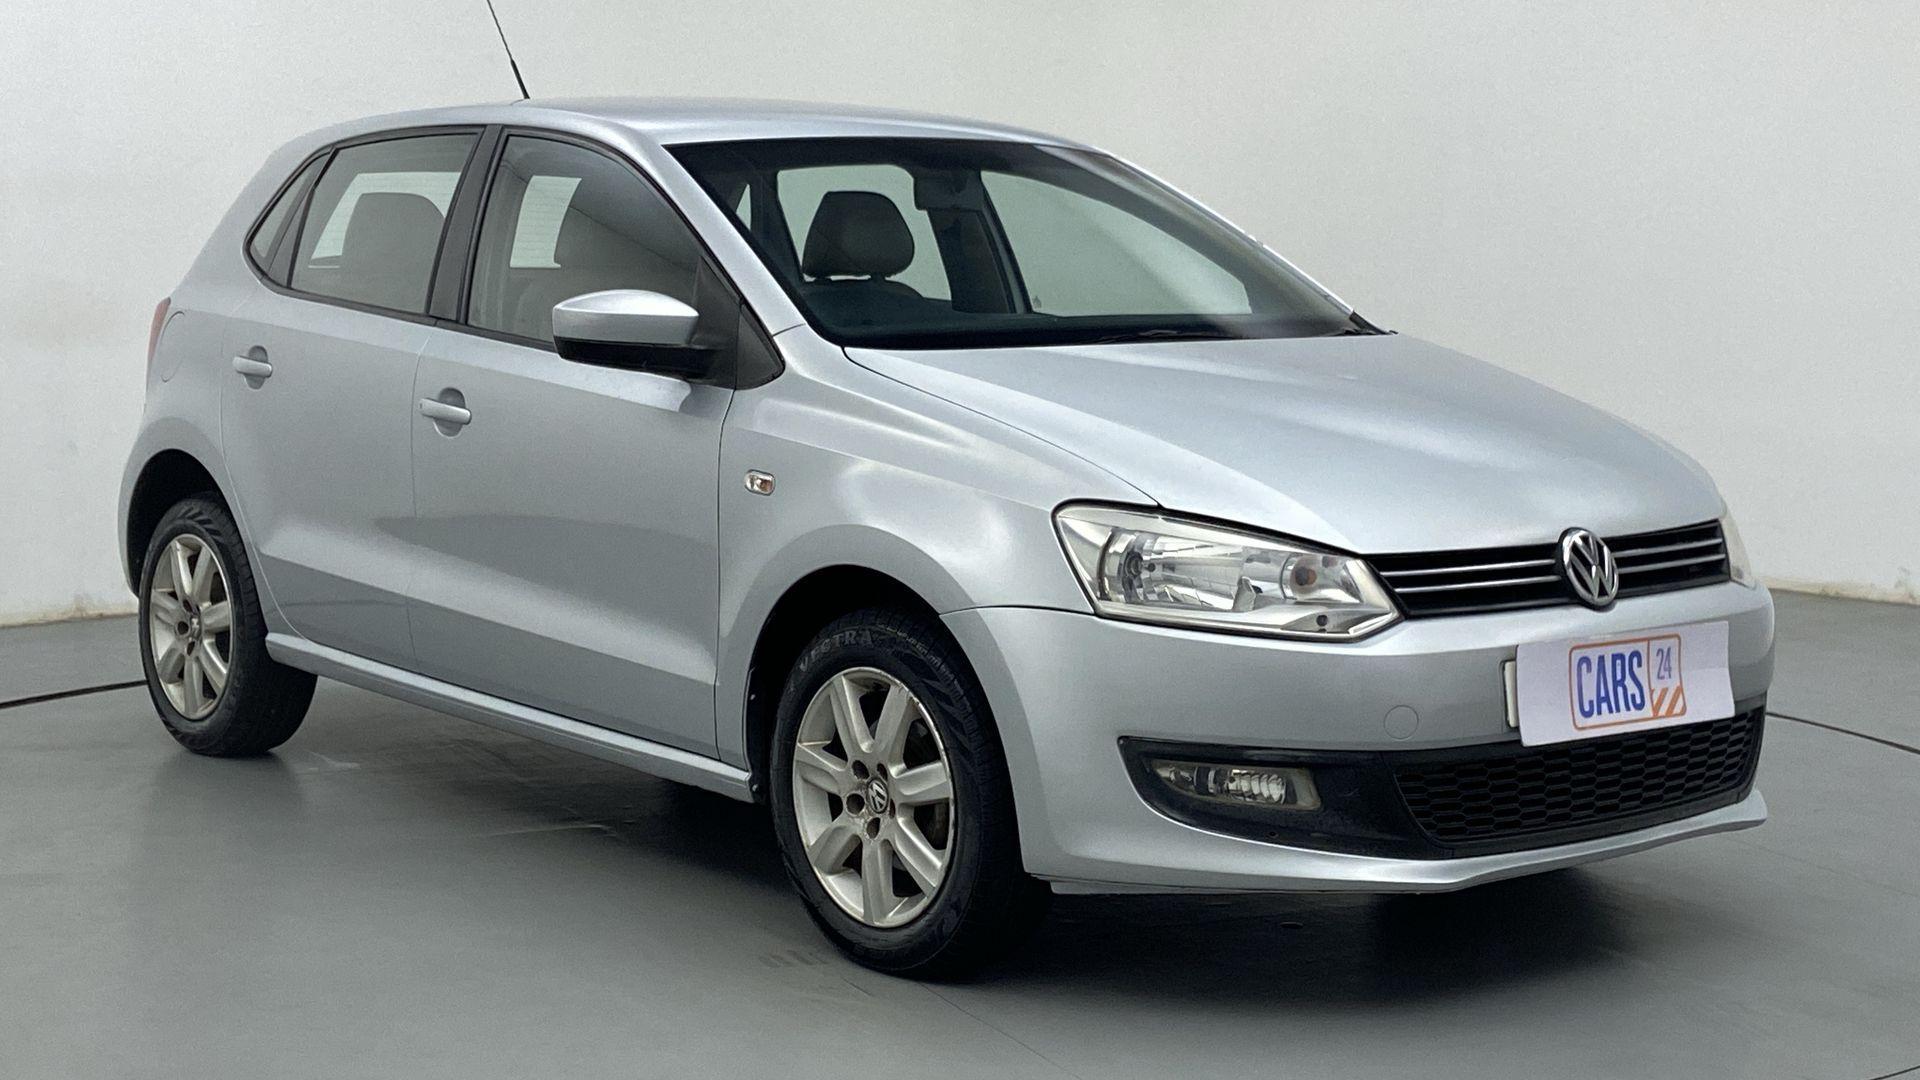 2010 Volkswagen Polo HIGHLINE1.2L DIESEL